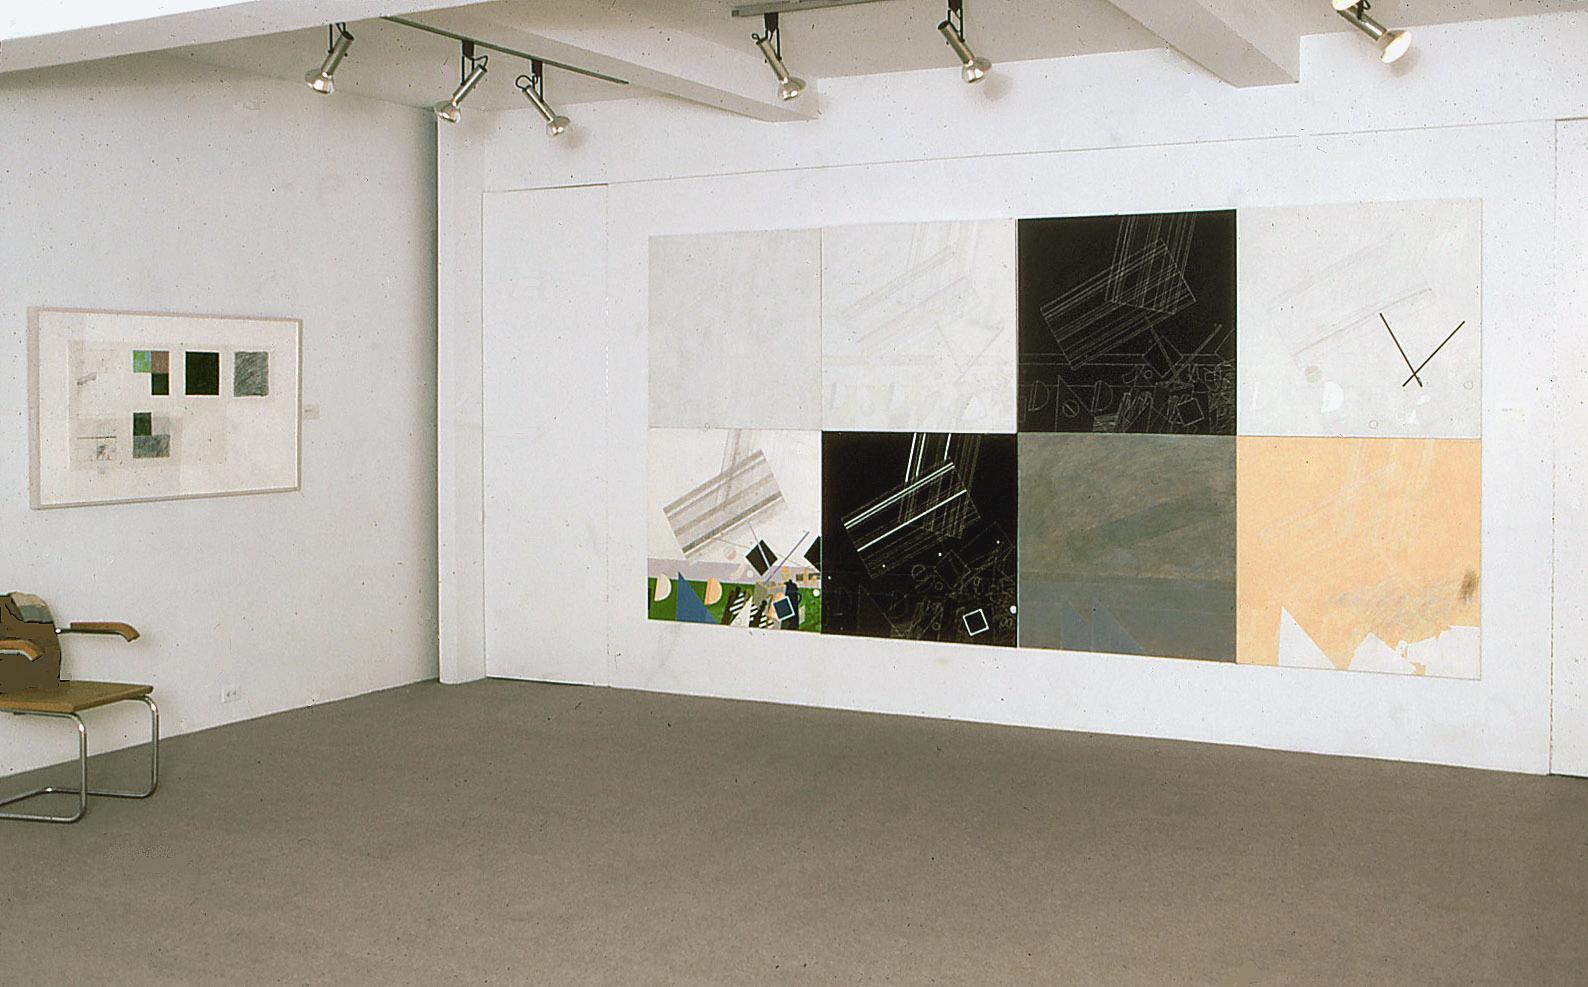 Wystawa wMarian Goodman Gallery, Nowy Jork, 1981